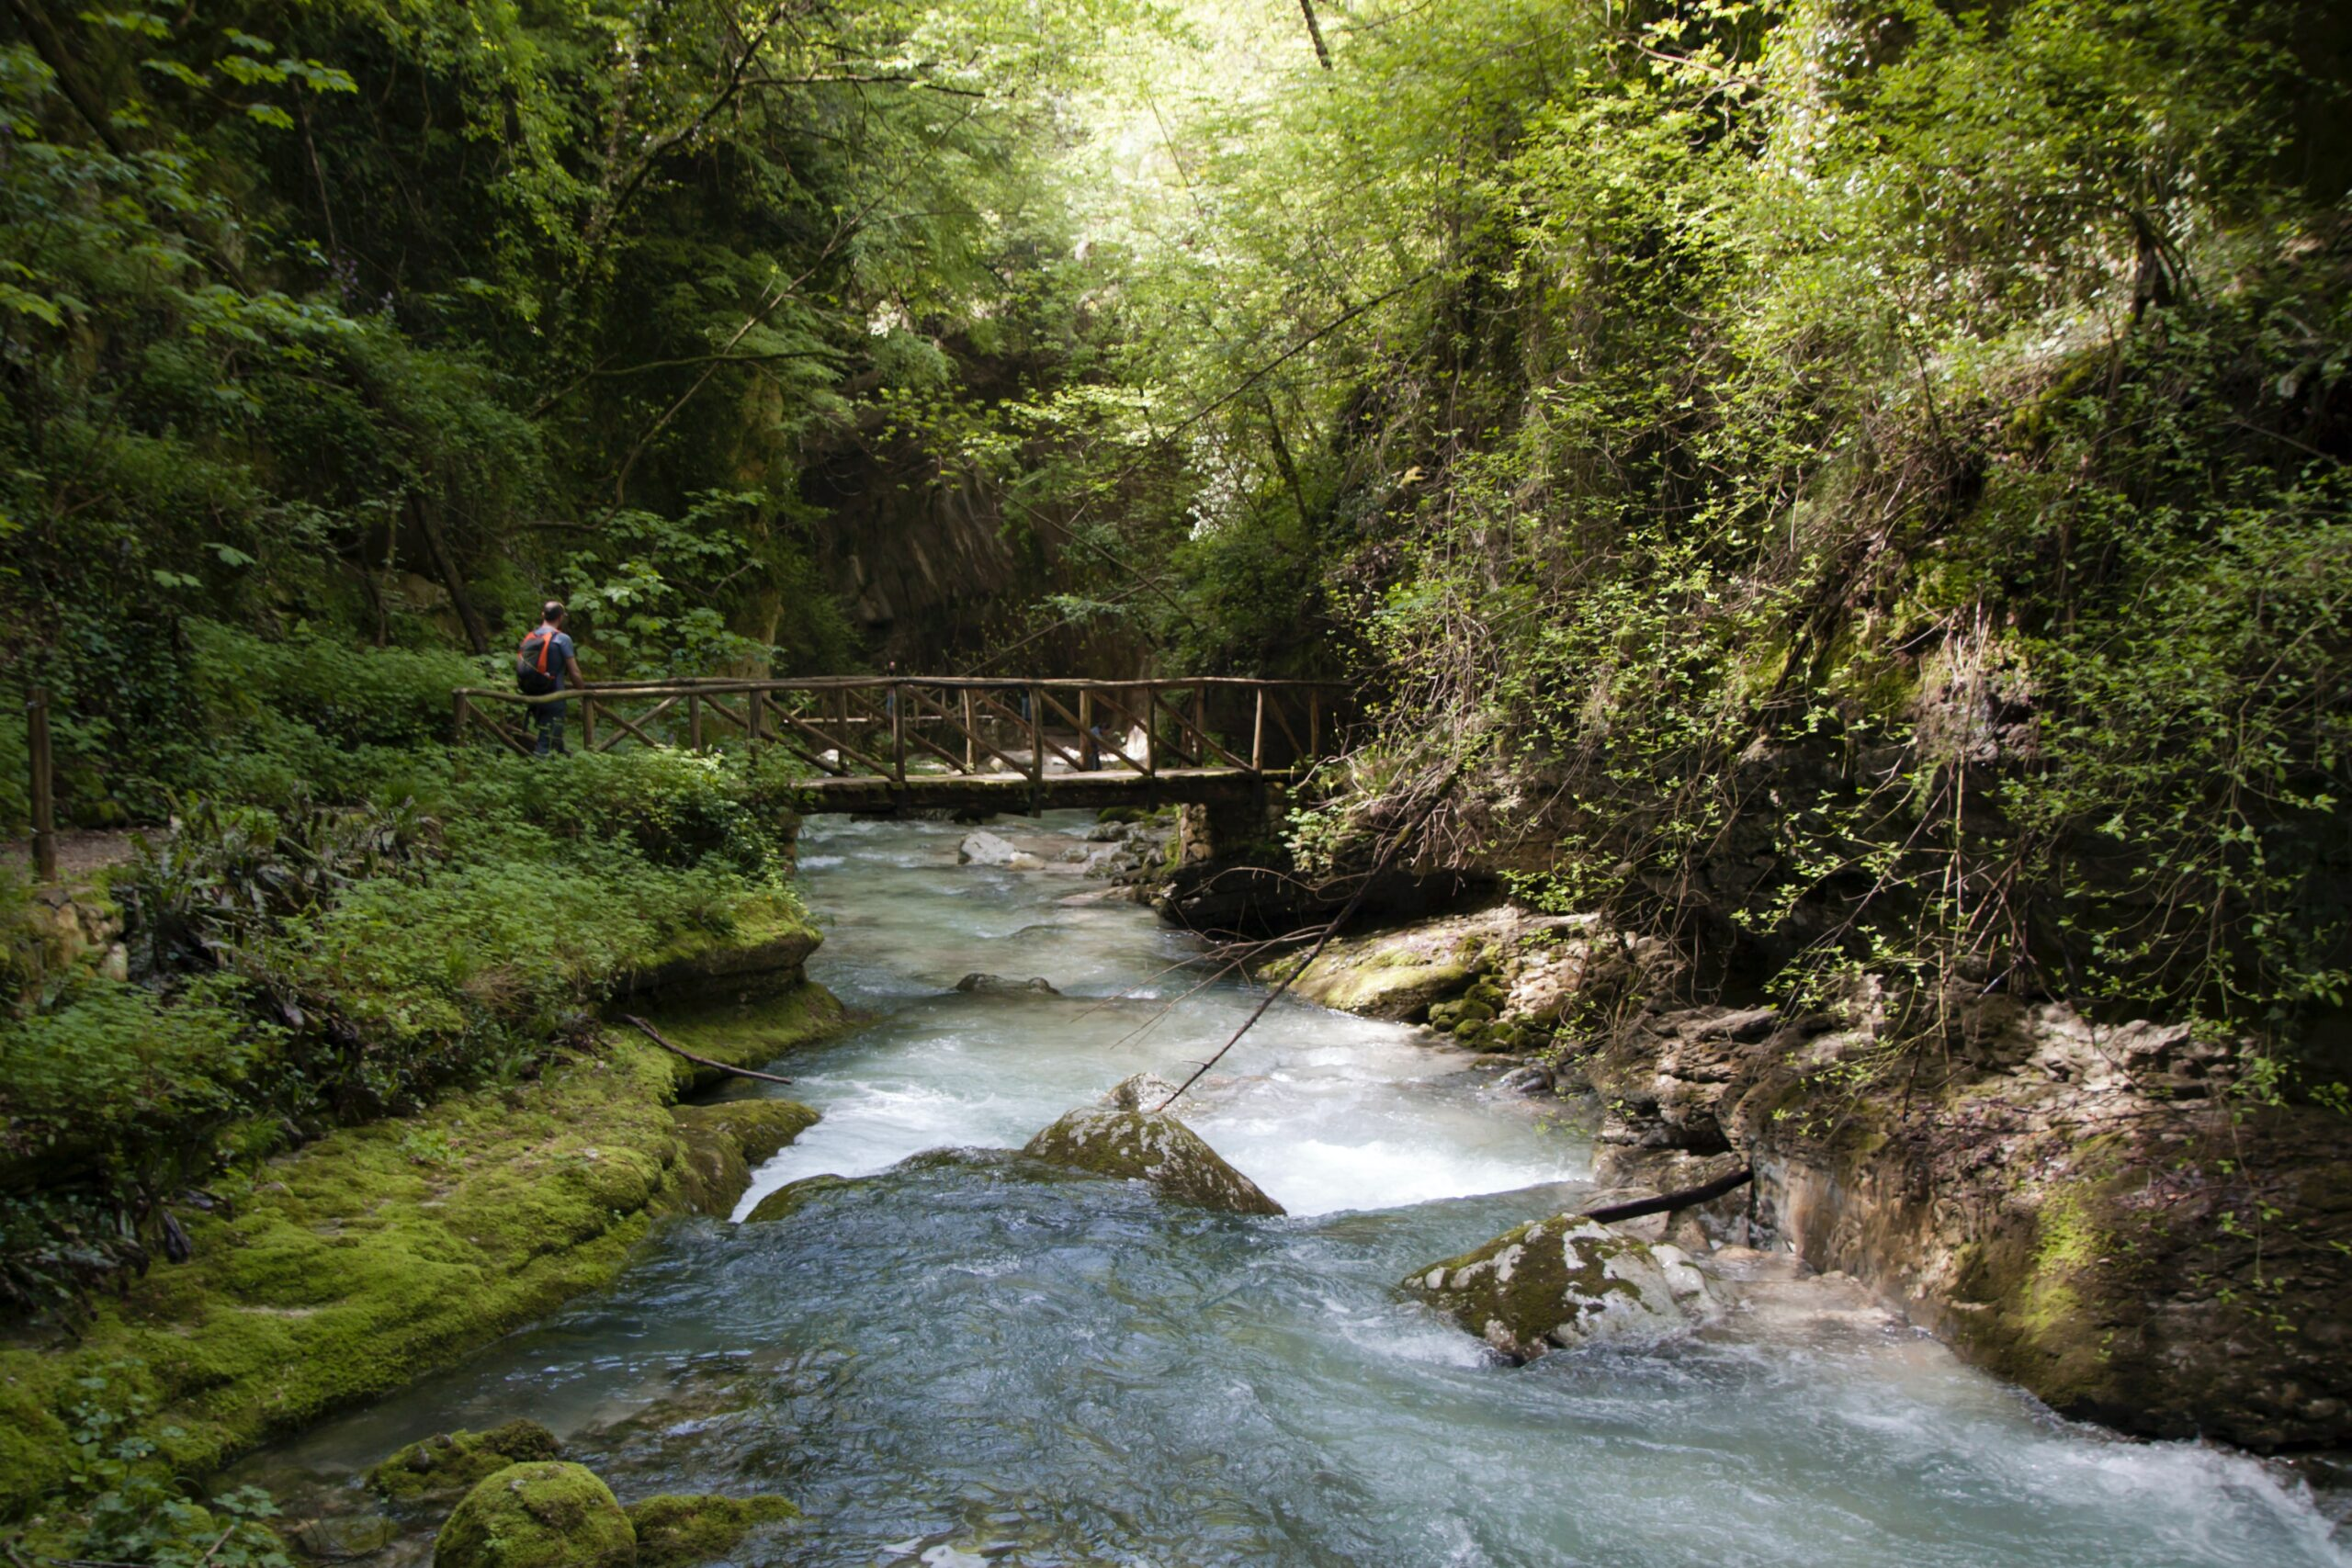 Undertourism and Post-Covid scenarios in Italy